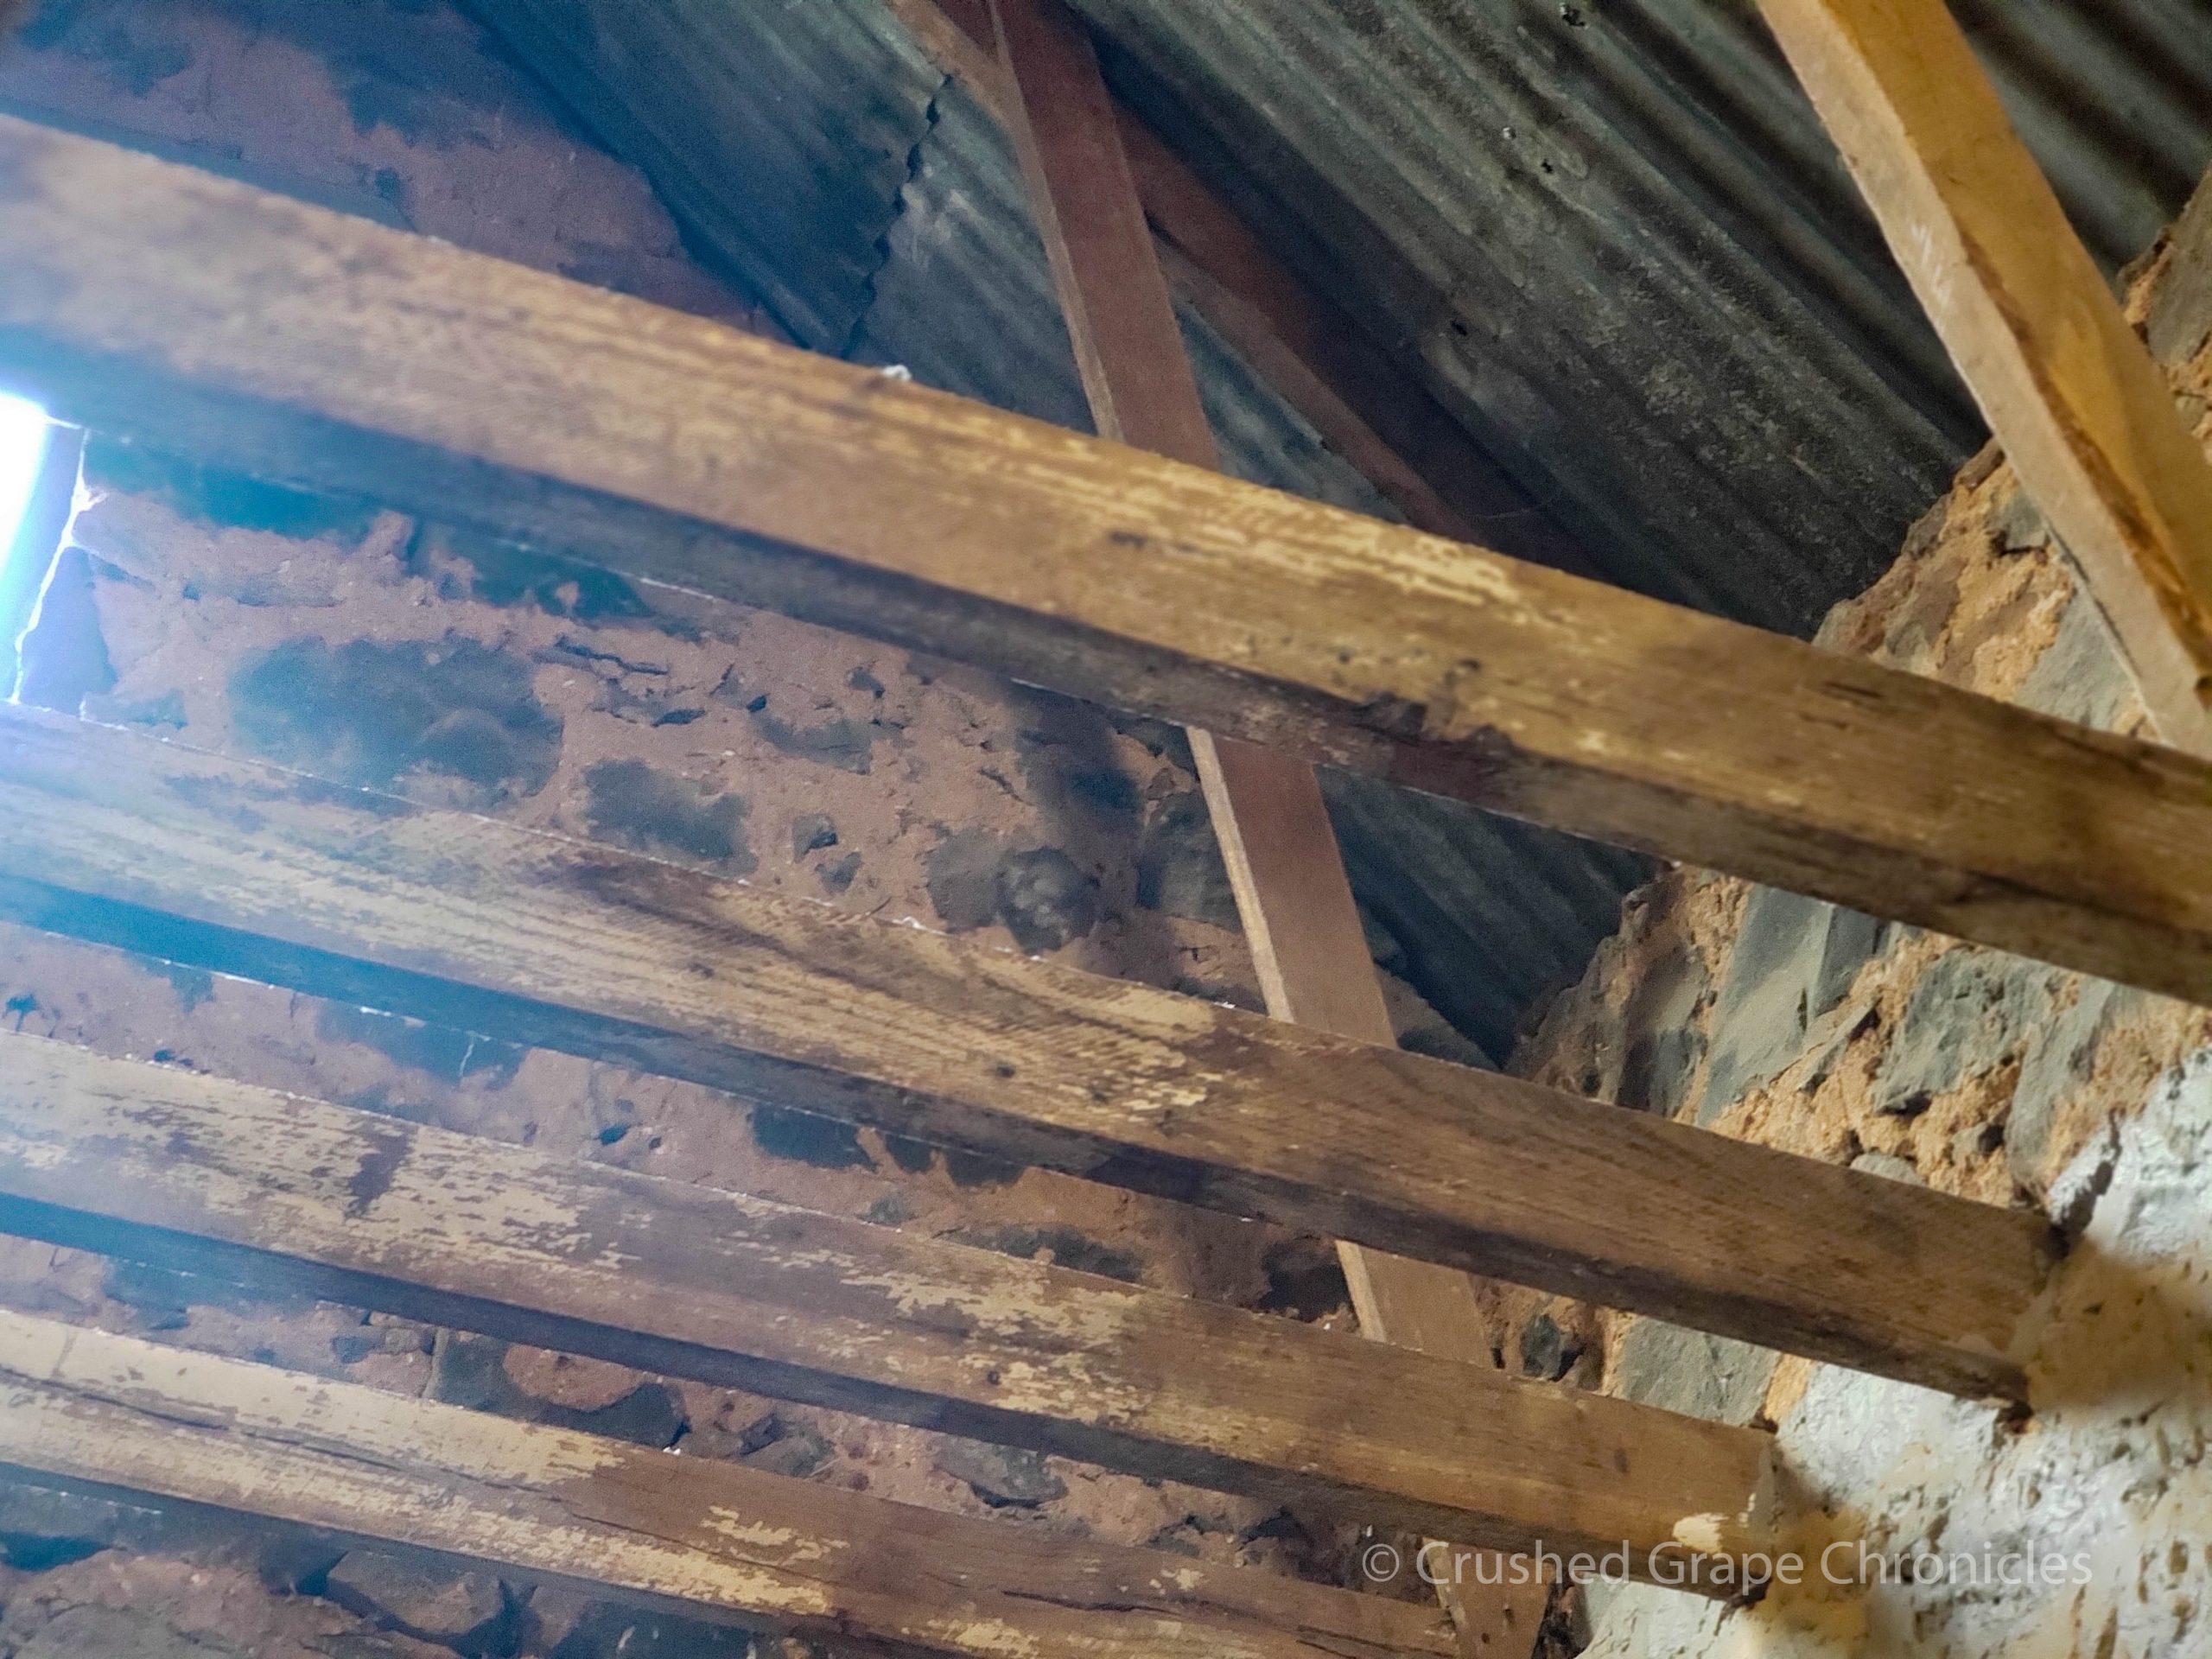 Angullong Vineyard converted stable into Cellar door in Millthorpe, Orange NSW Australia